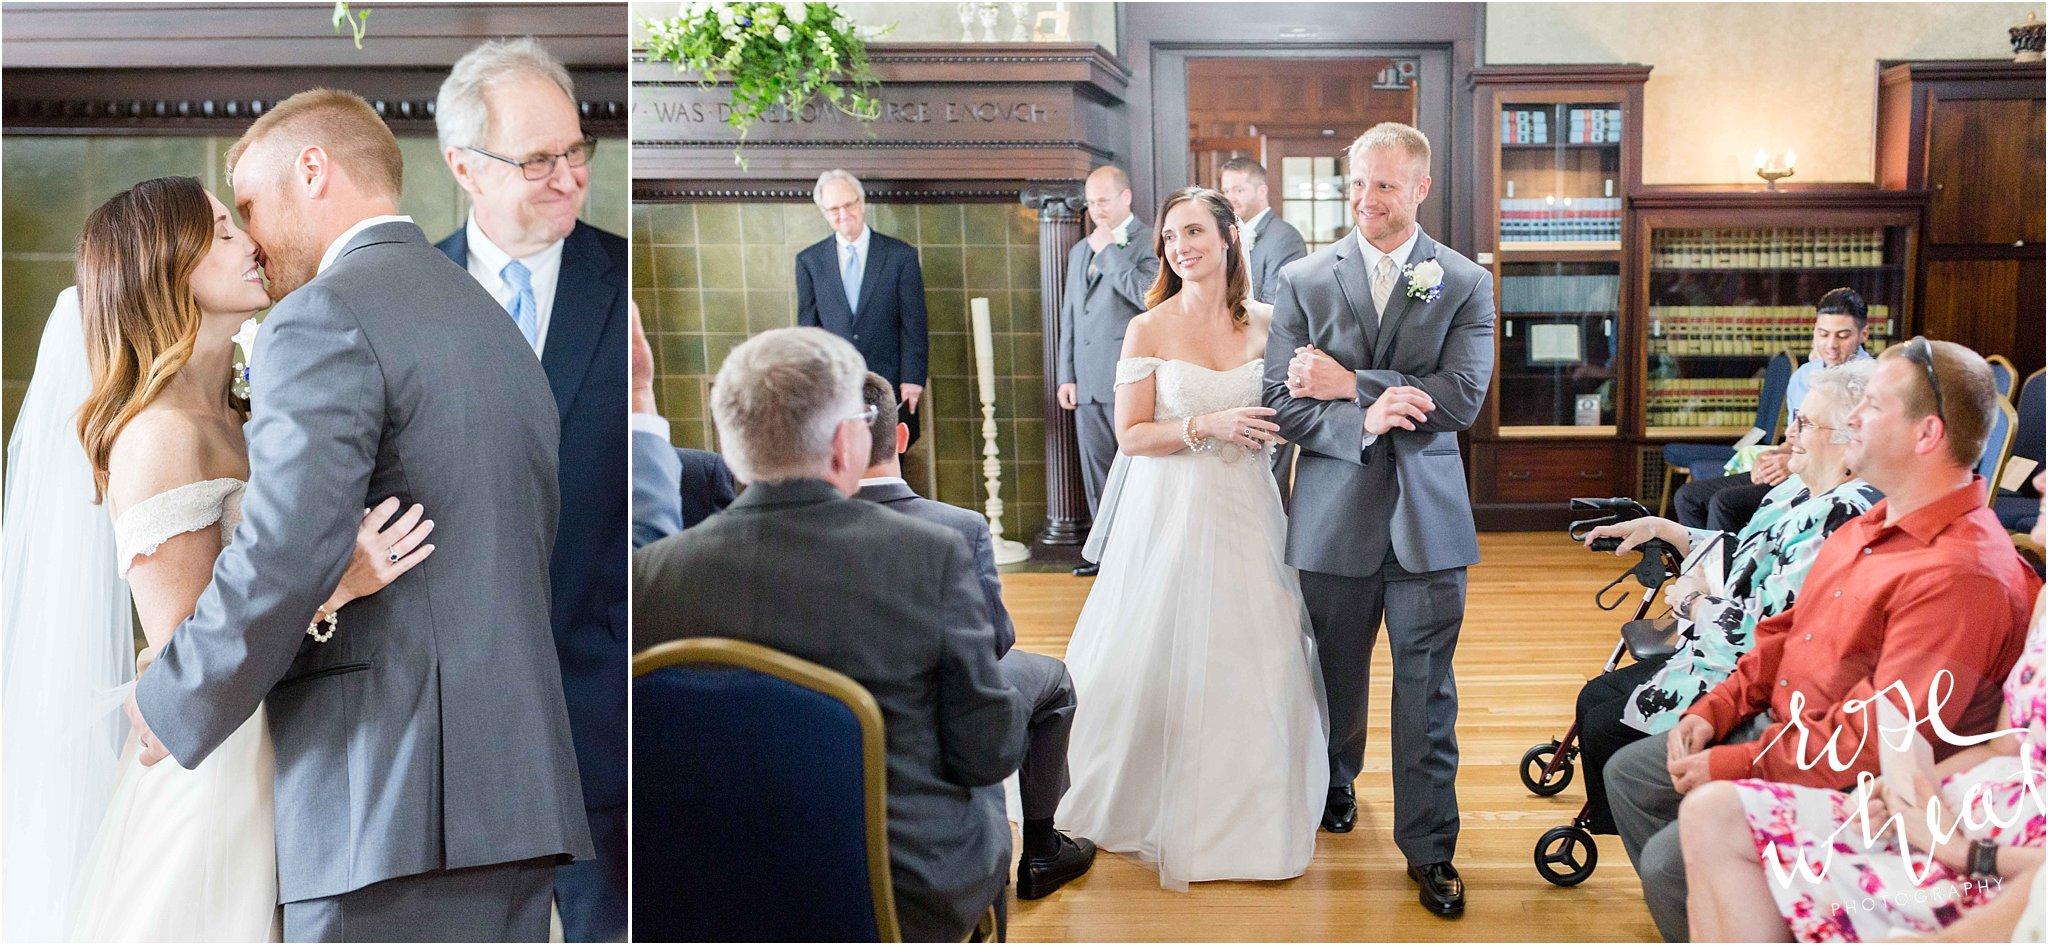 0430004. Dillon House Topeka KS Wedding Ceremony.JPG